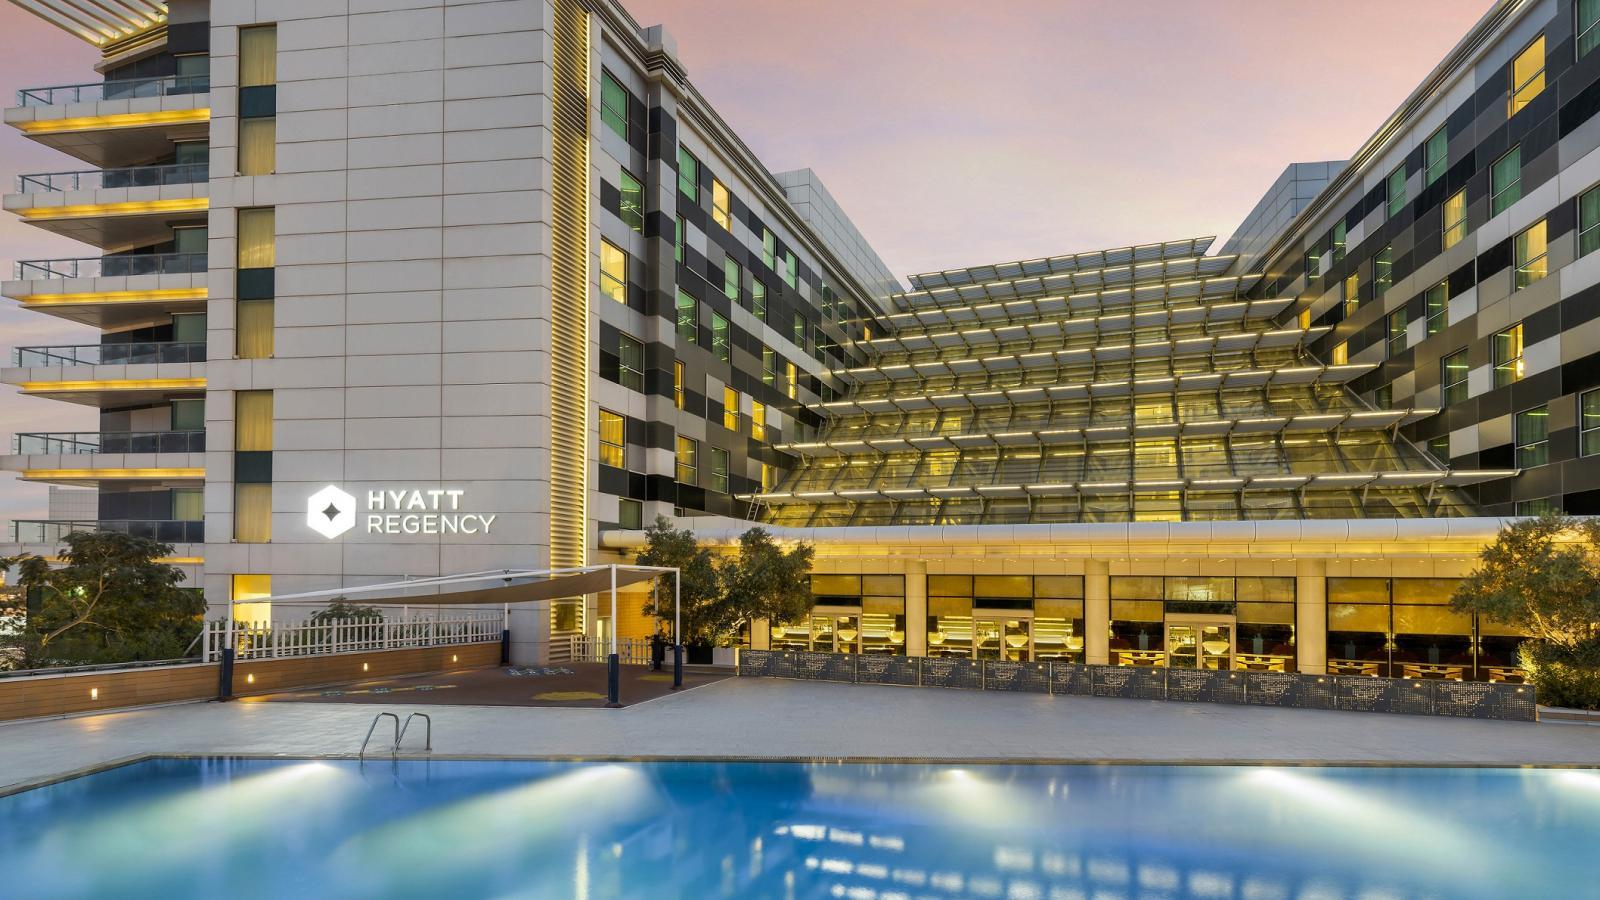 Hyatt Regency Oryx Doha to live stream the Euro Cup 2020